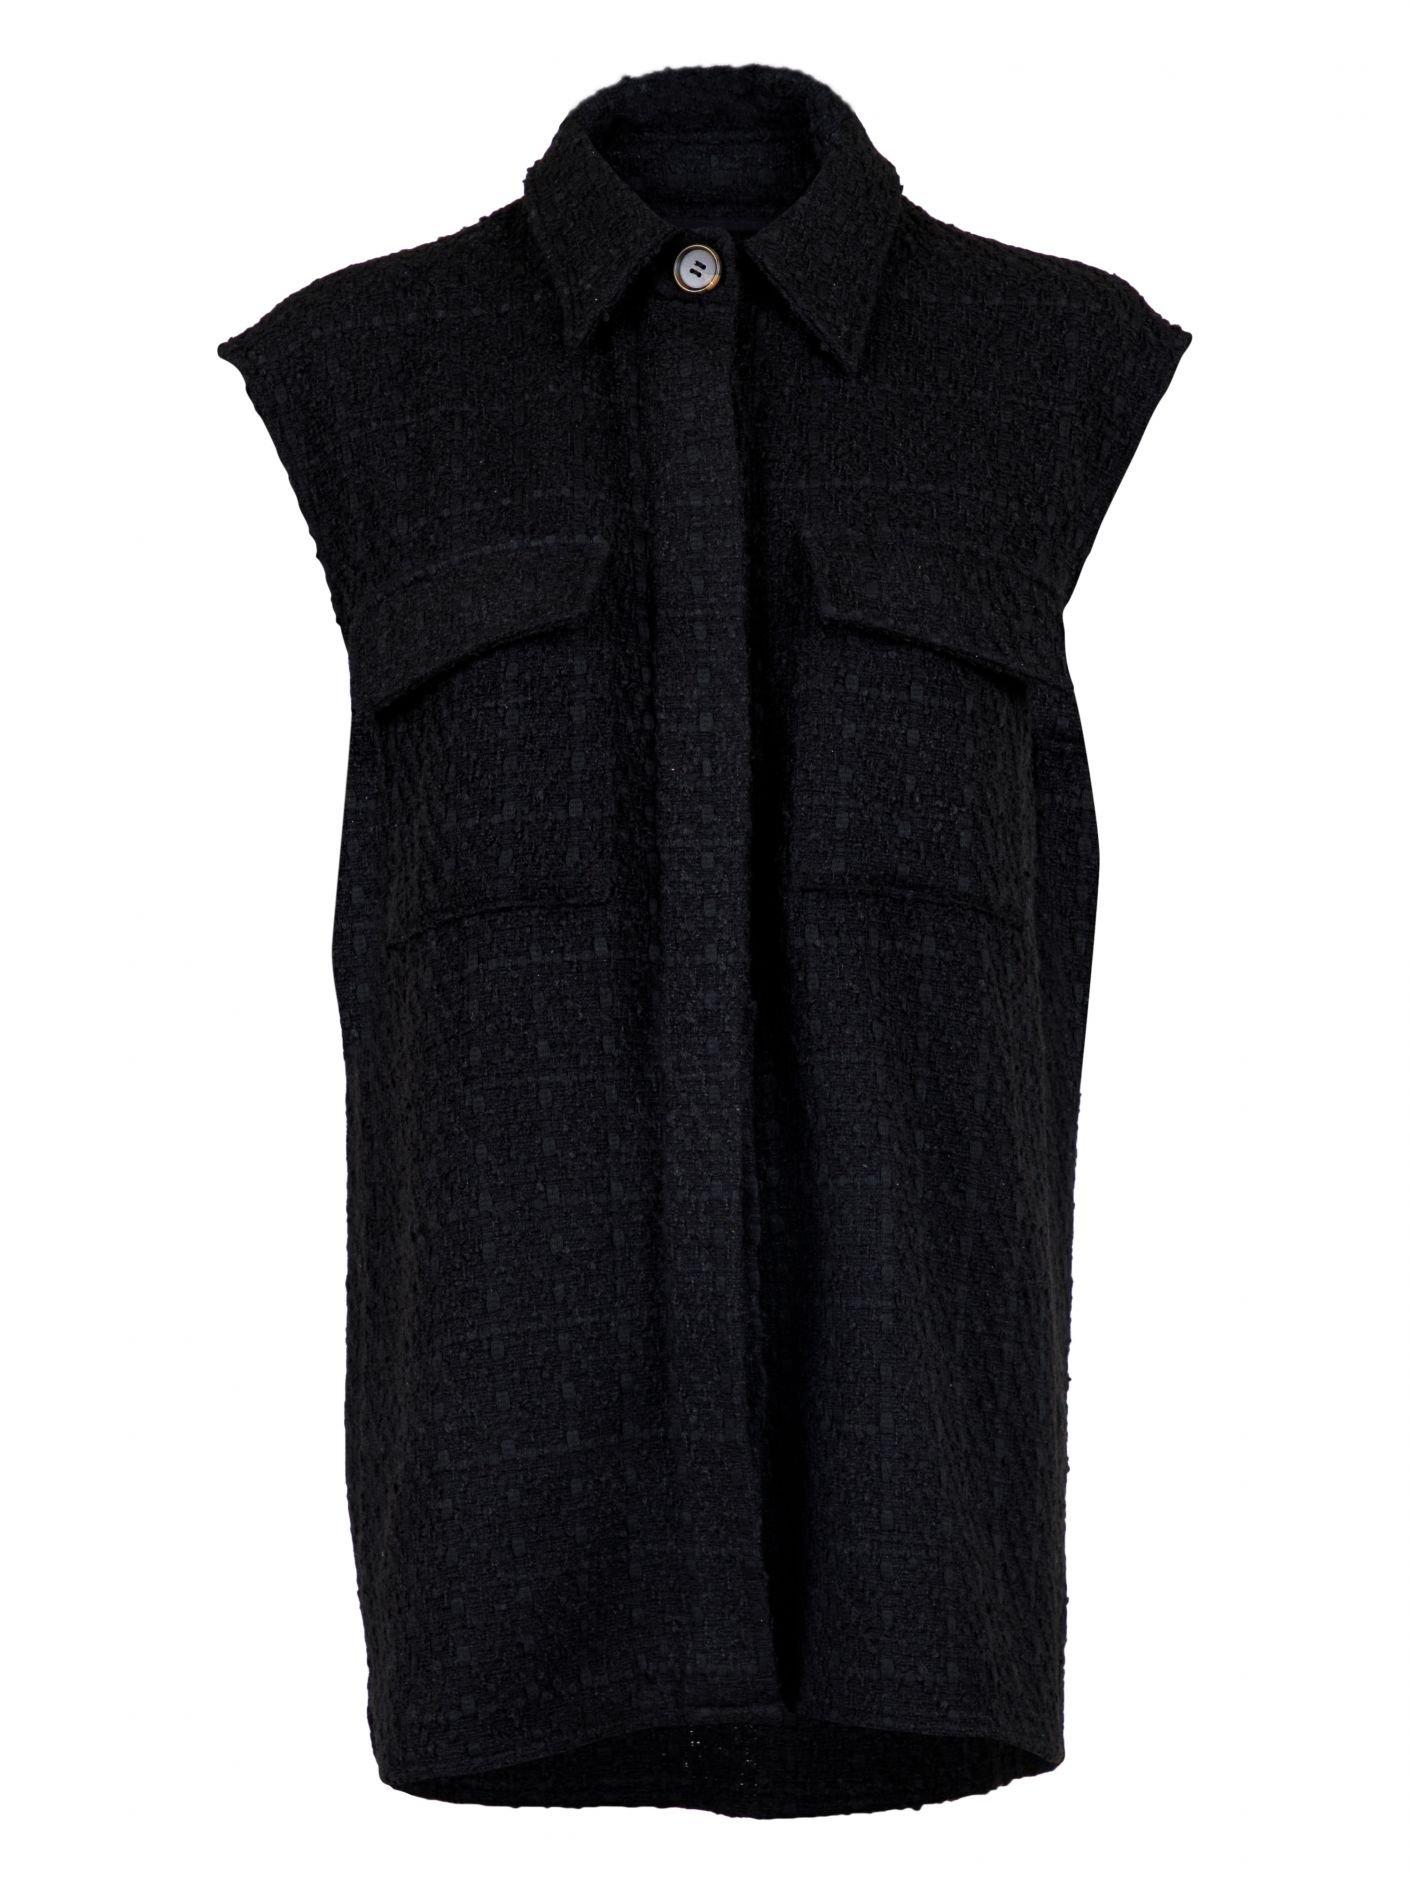 Neo Noir Cable Boucle Waistcoat